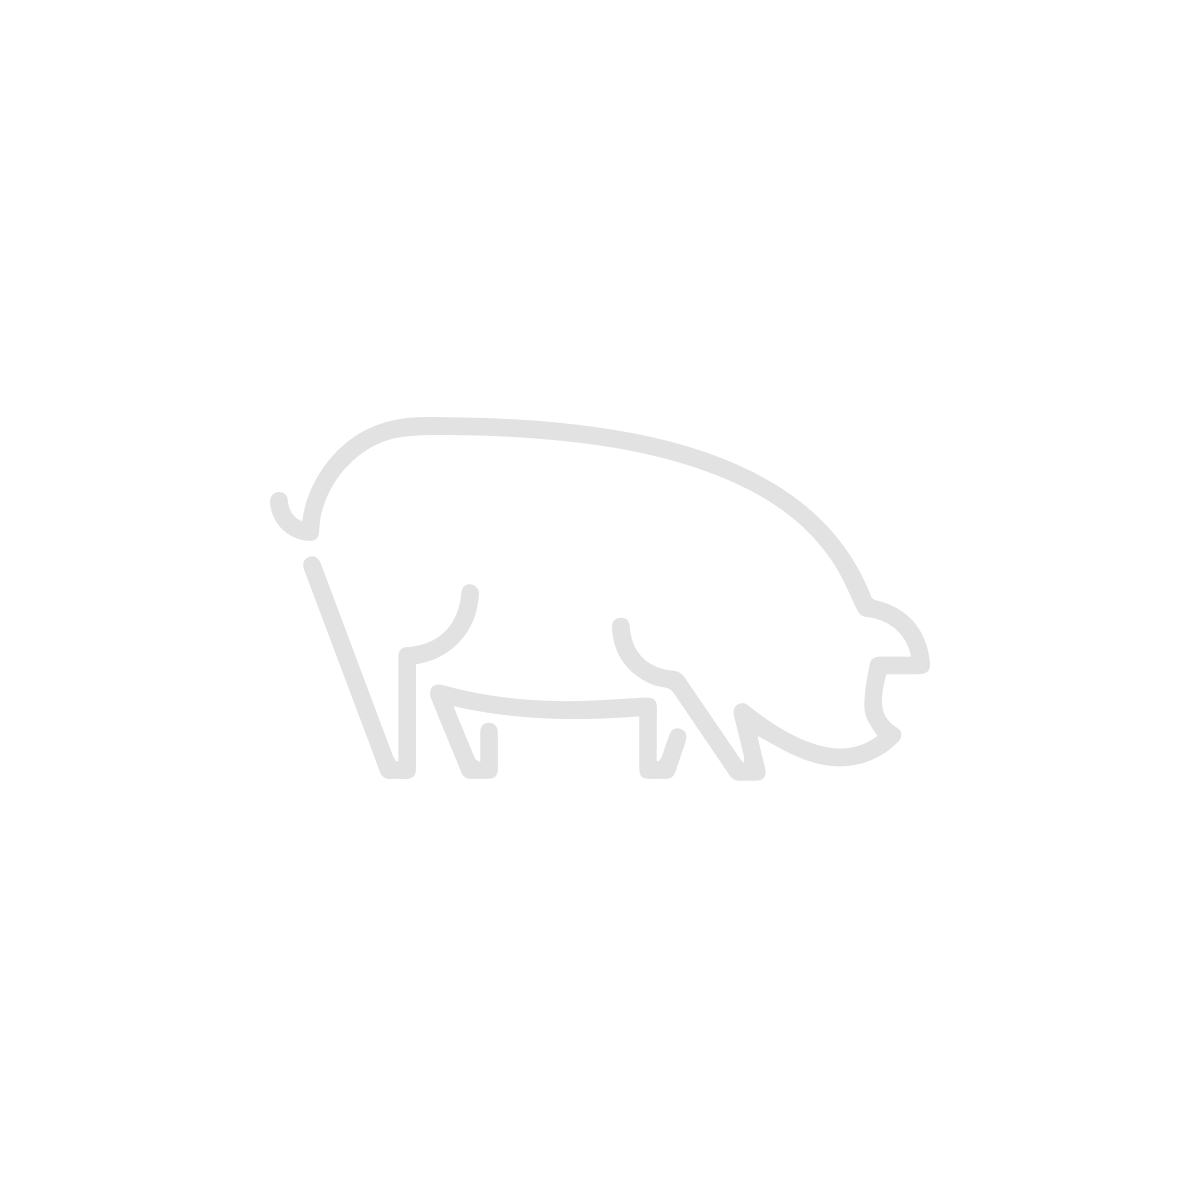 Đakovačka Kobasica od Crne slavonske svinje Placeholder